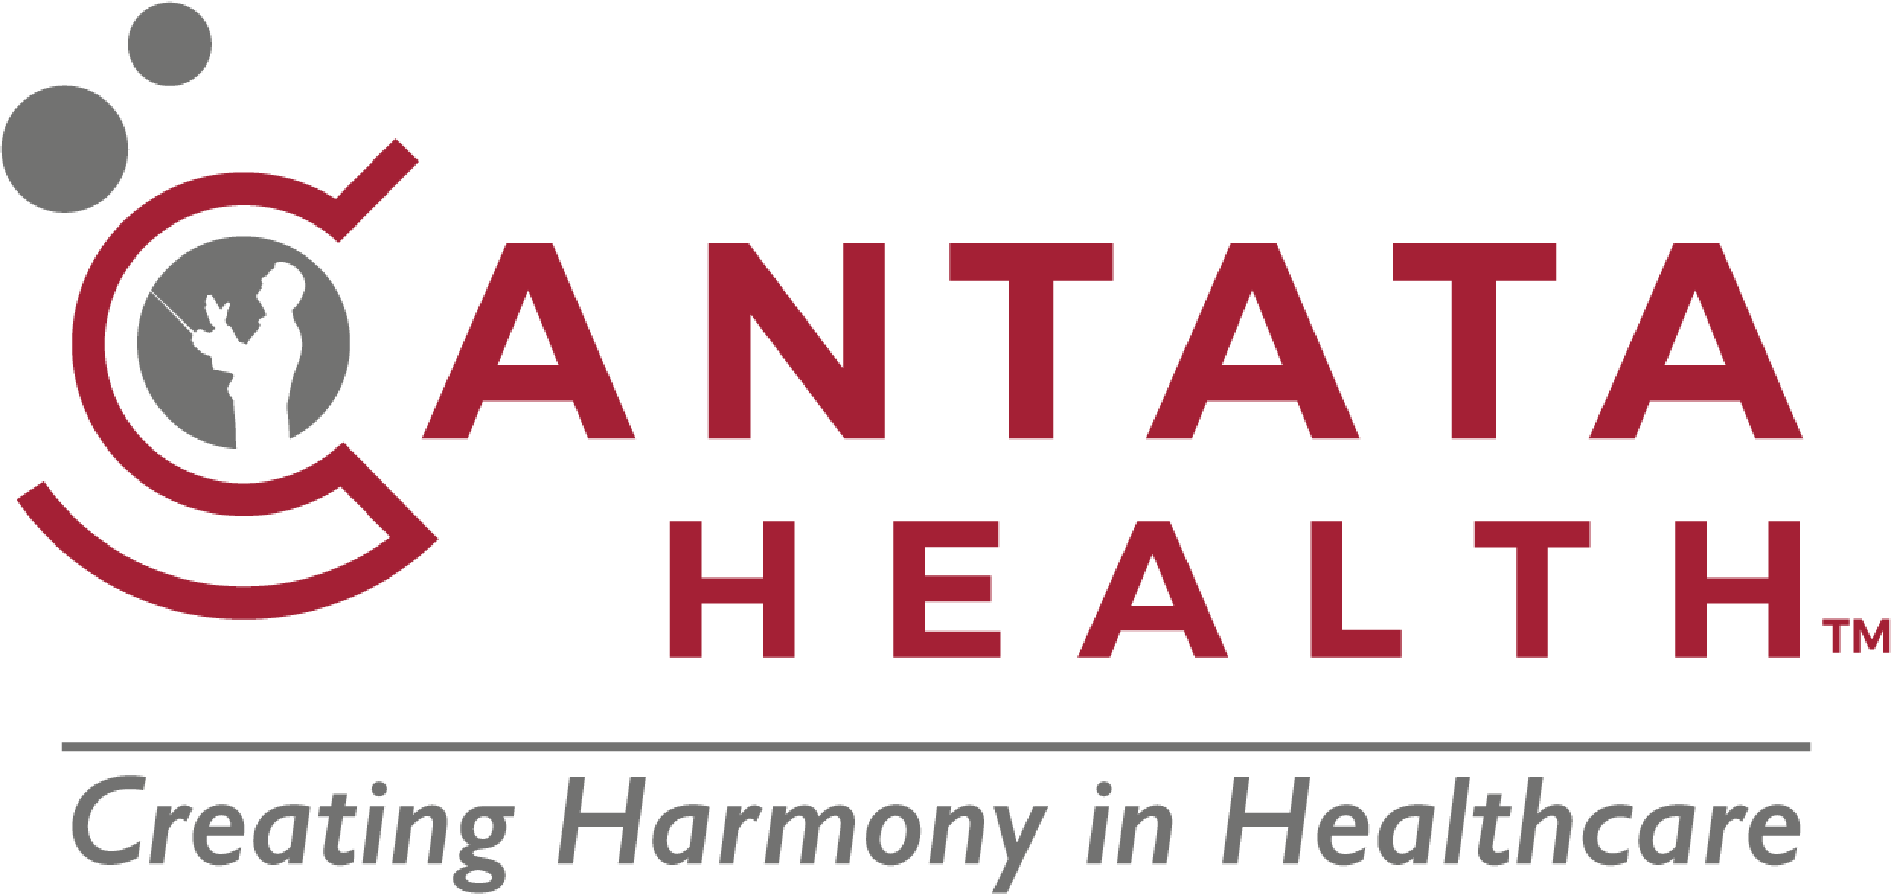 Oliver Wyman Health Innovation Summit 2017